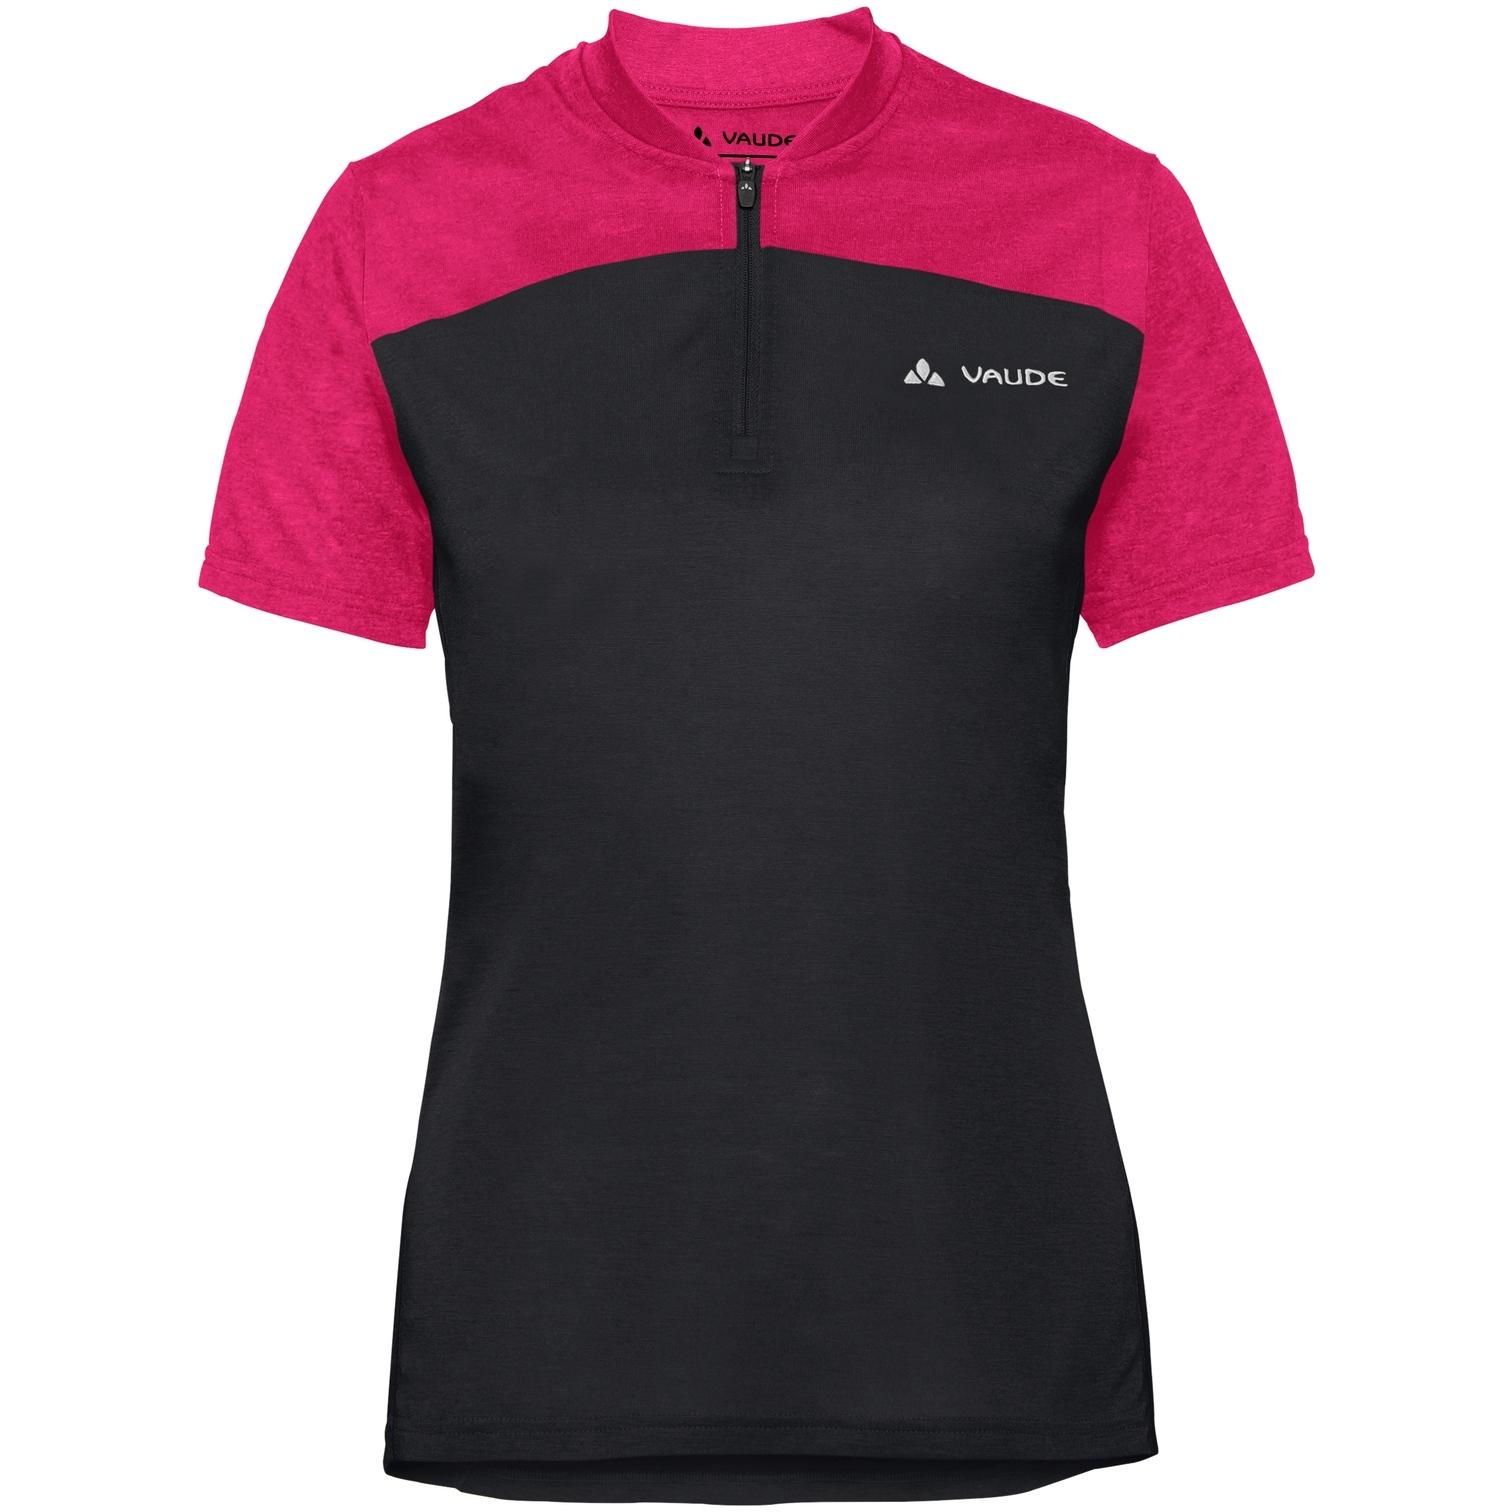 Vaude Tremalzo Damen-Shirt IV - black